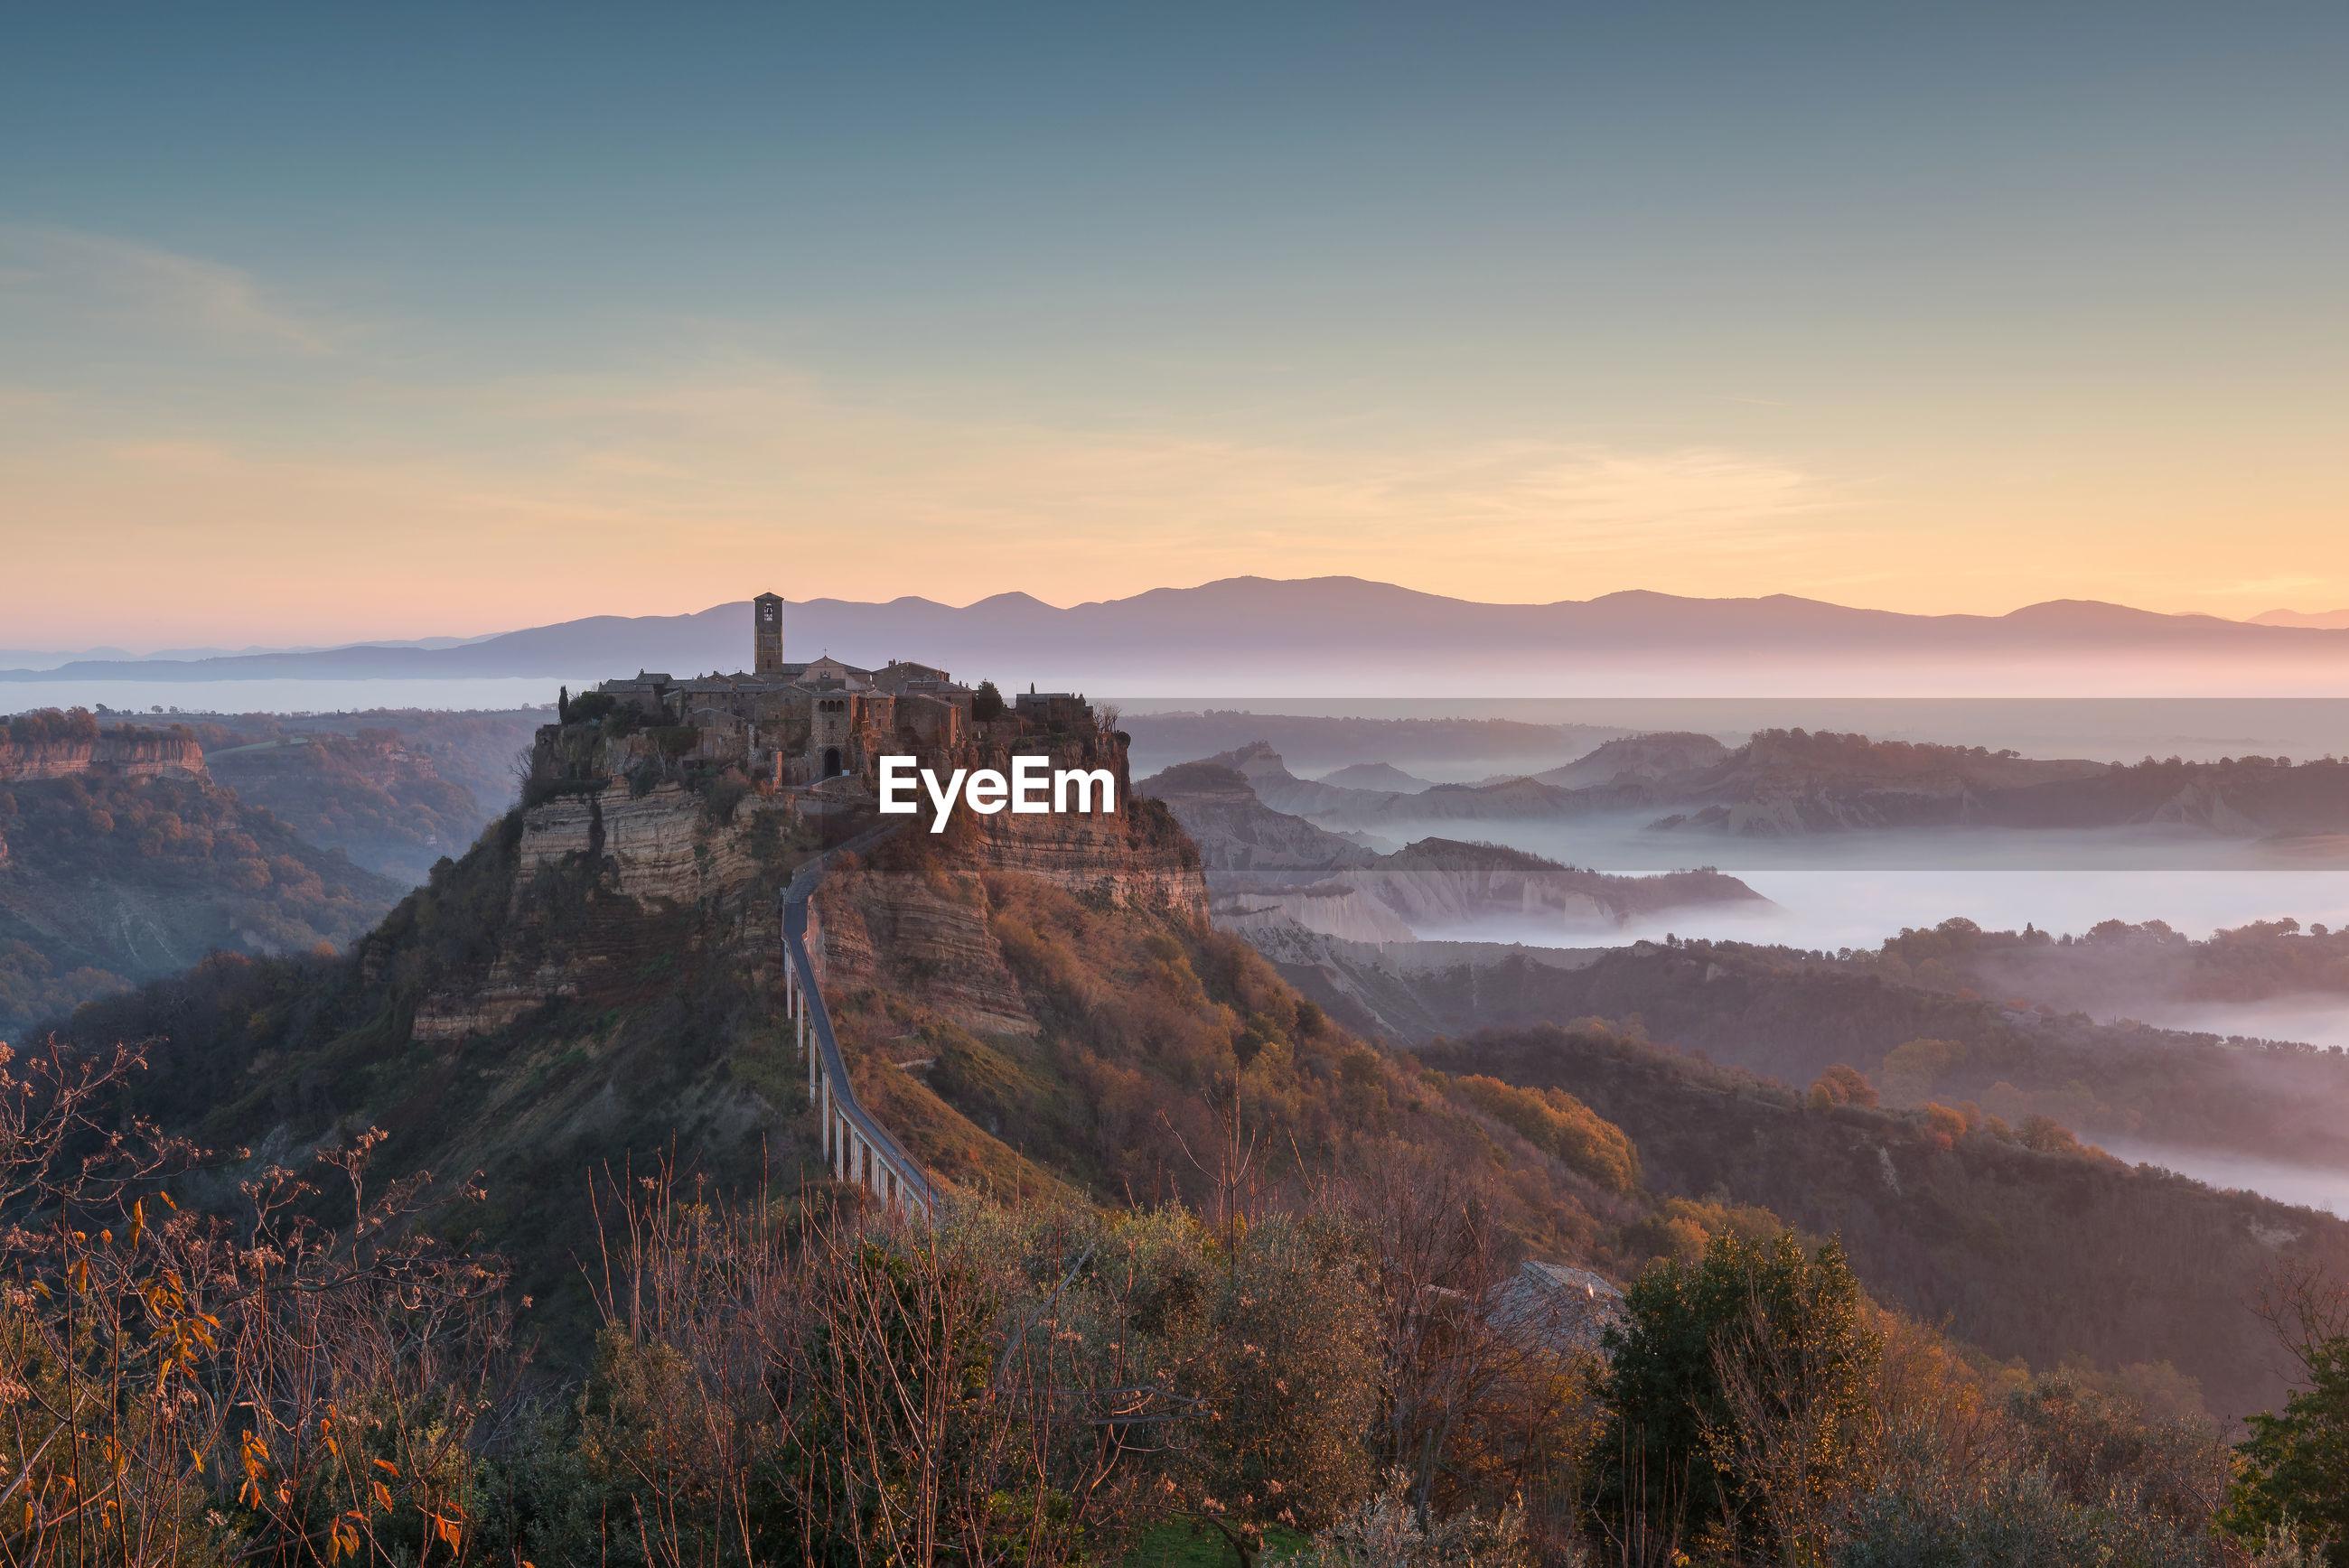 Scenic view of town on mountain peak